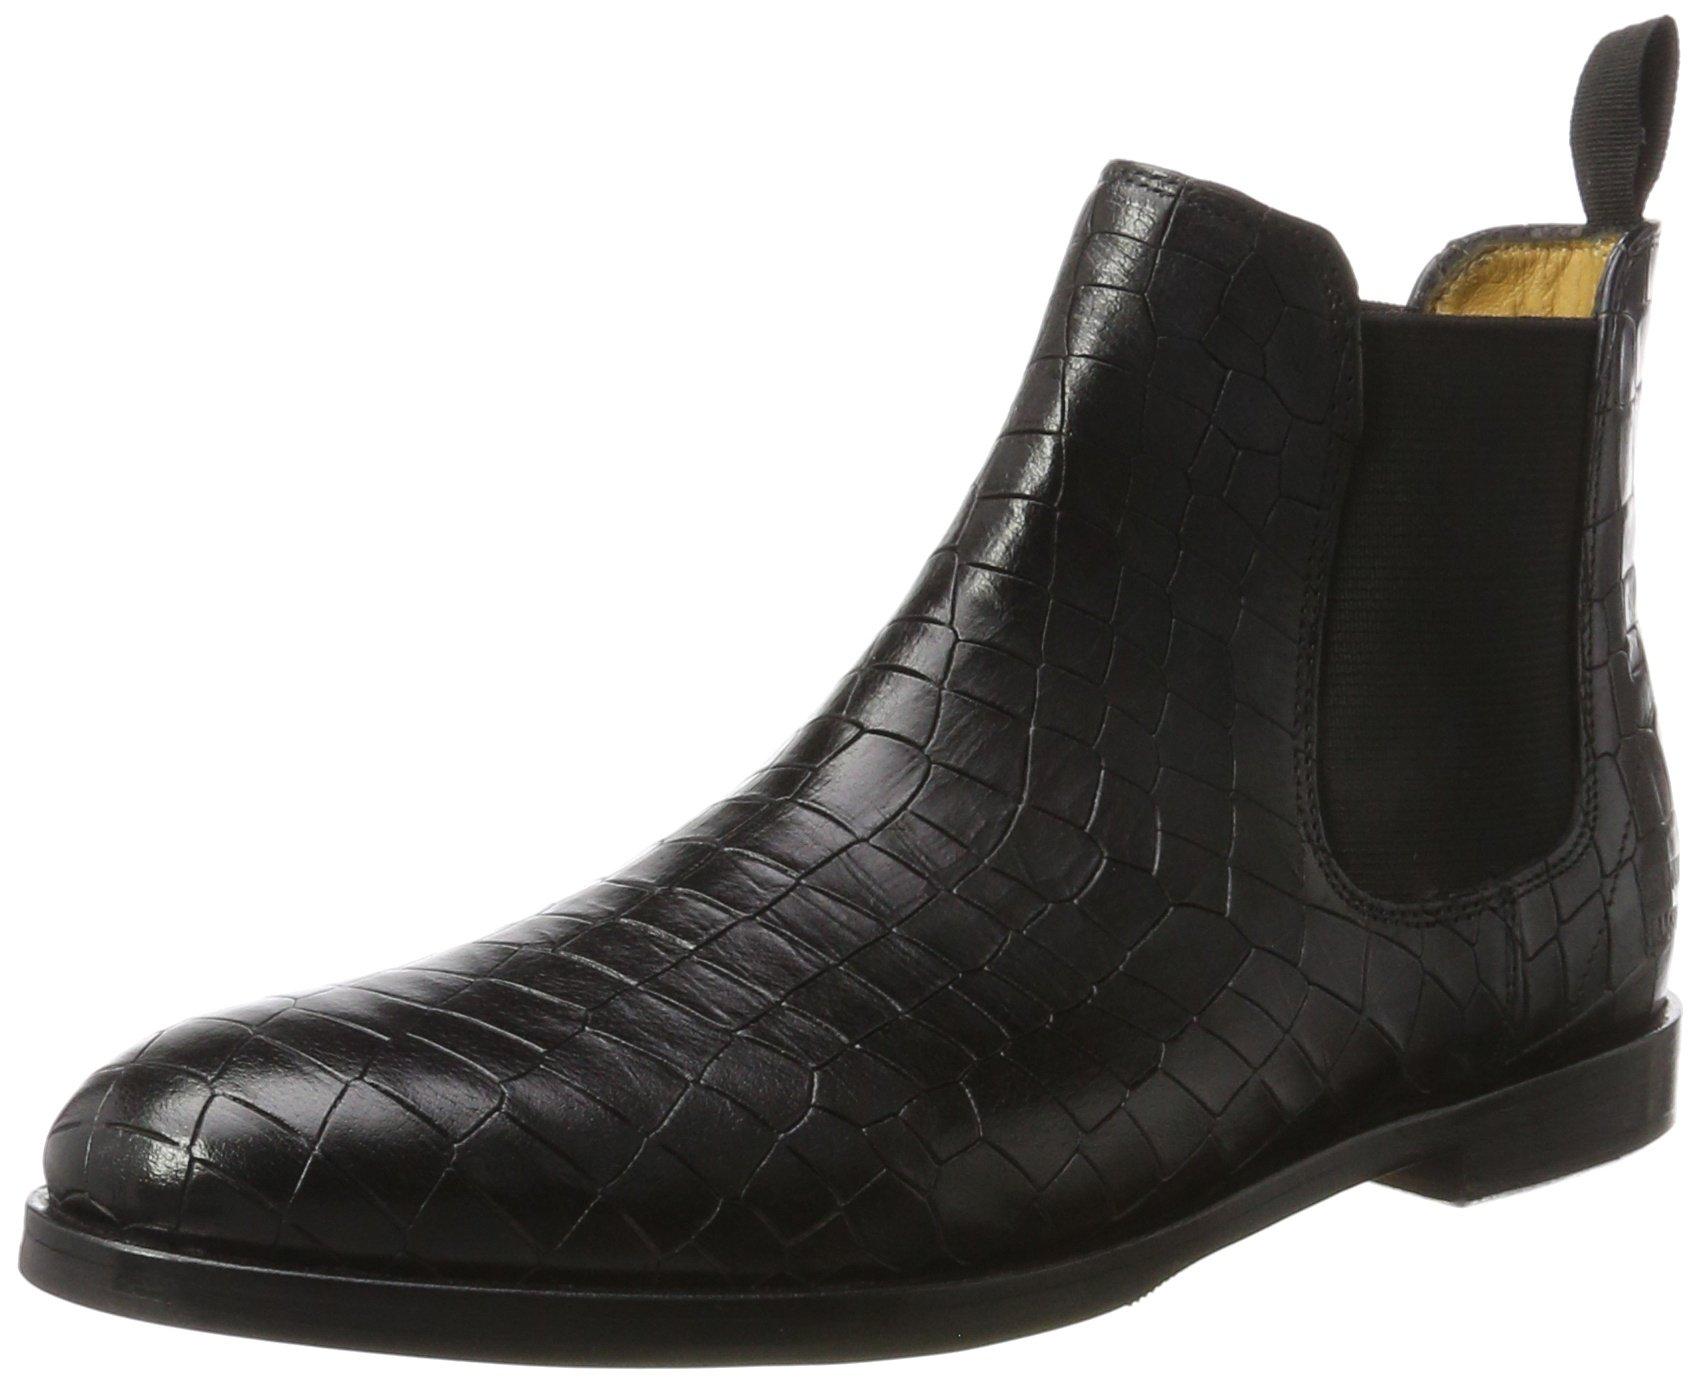 BlackElaBlkHrs36 Boots Eu aChelsea Hamilton Susan 10 FemmeNoir Crock Melvinamp; 1l5uTF3JKc